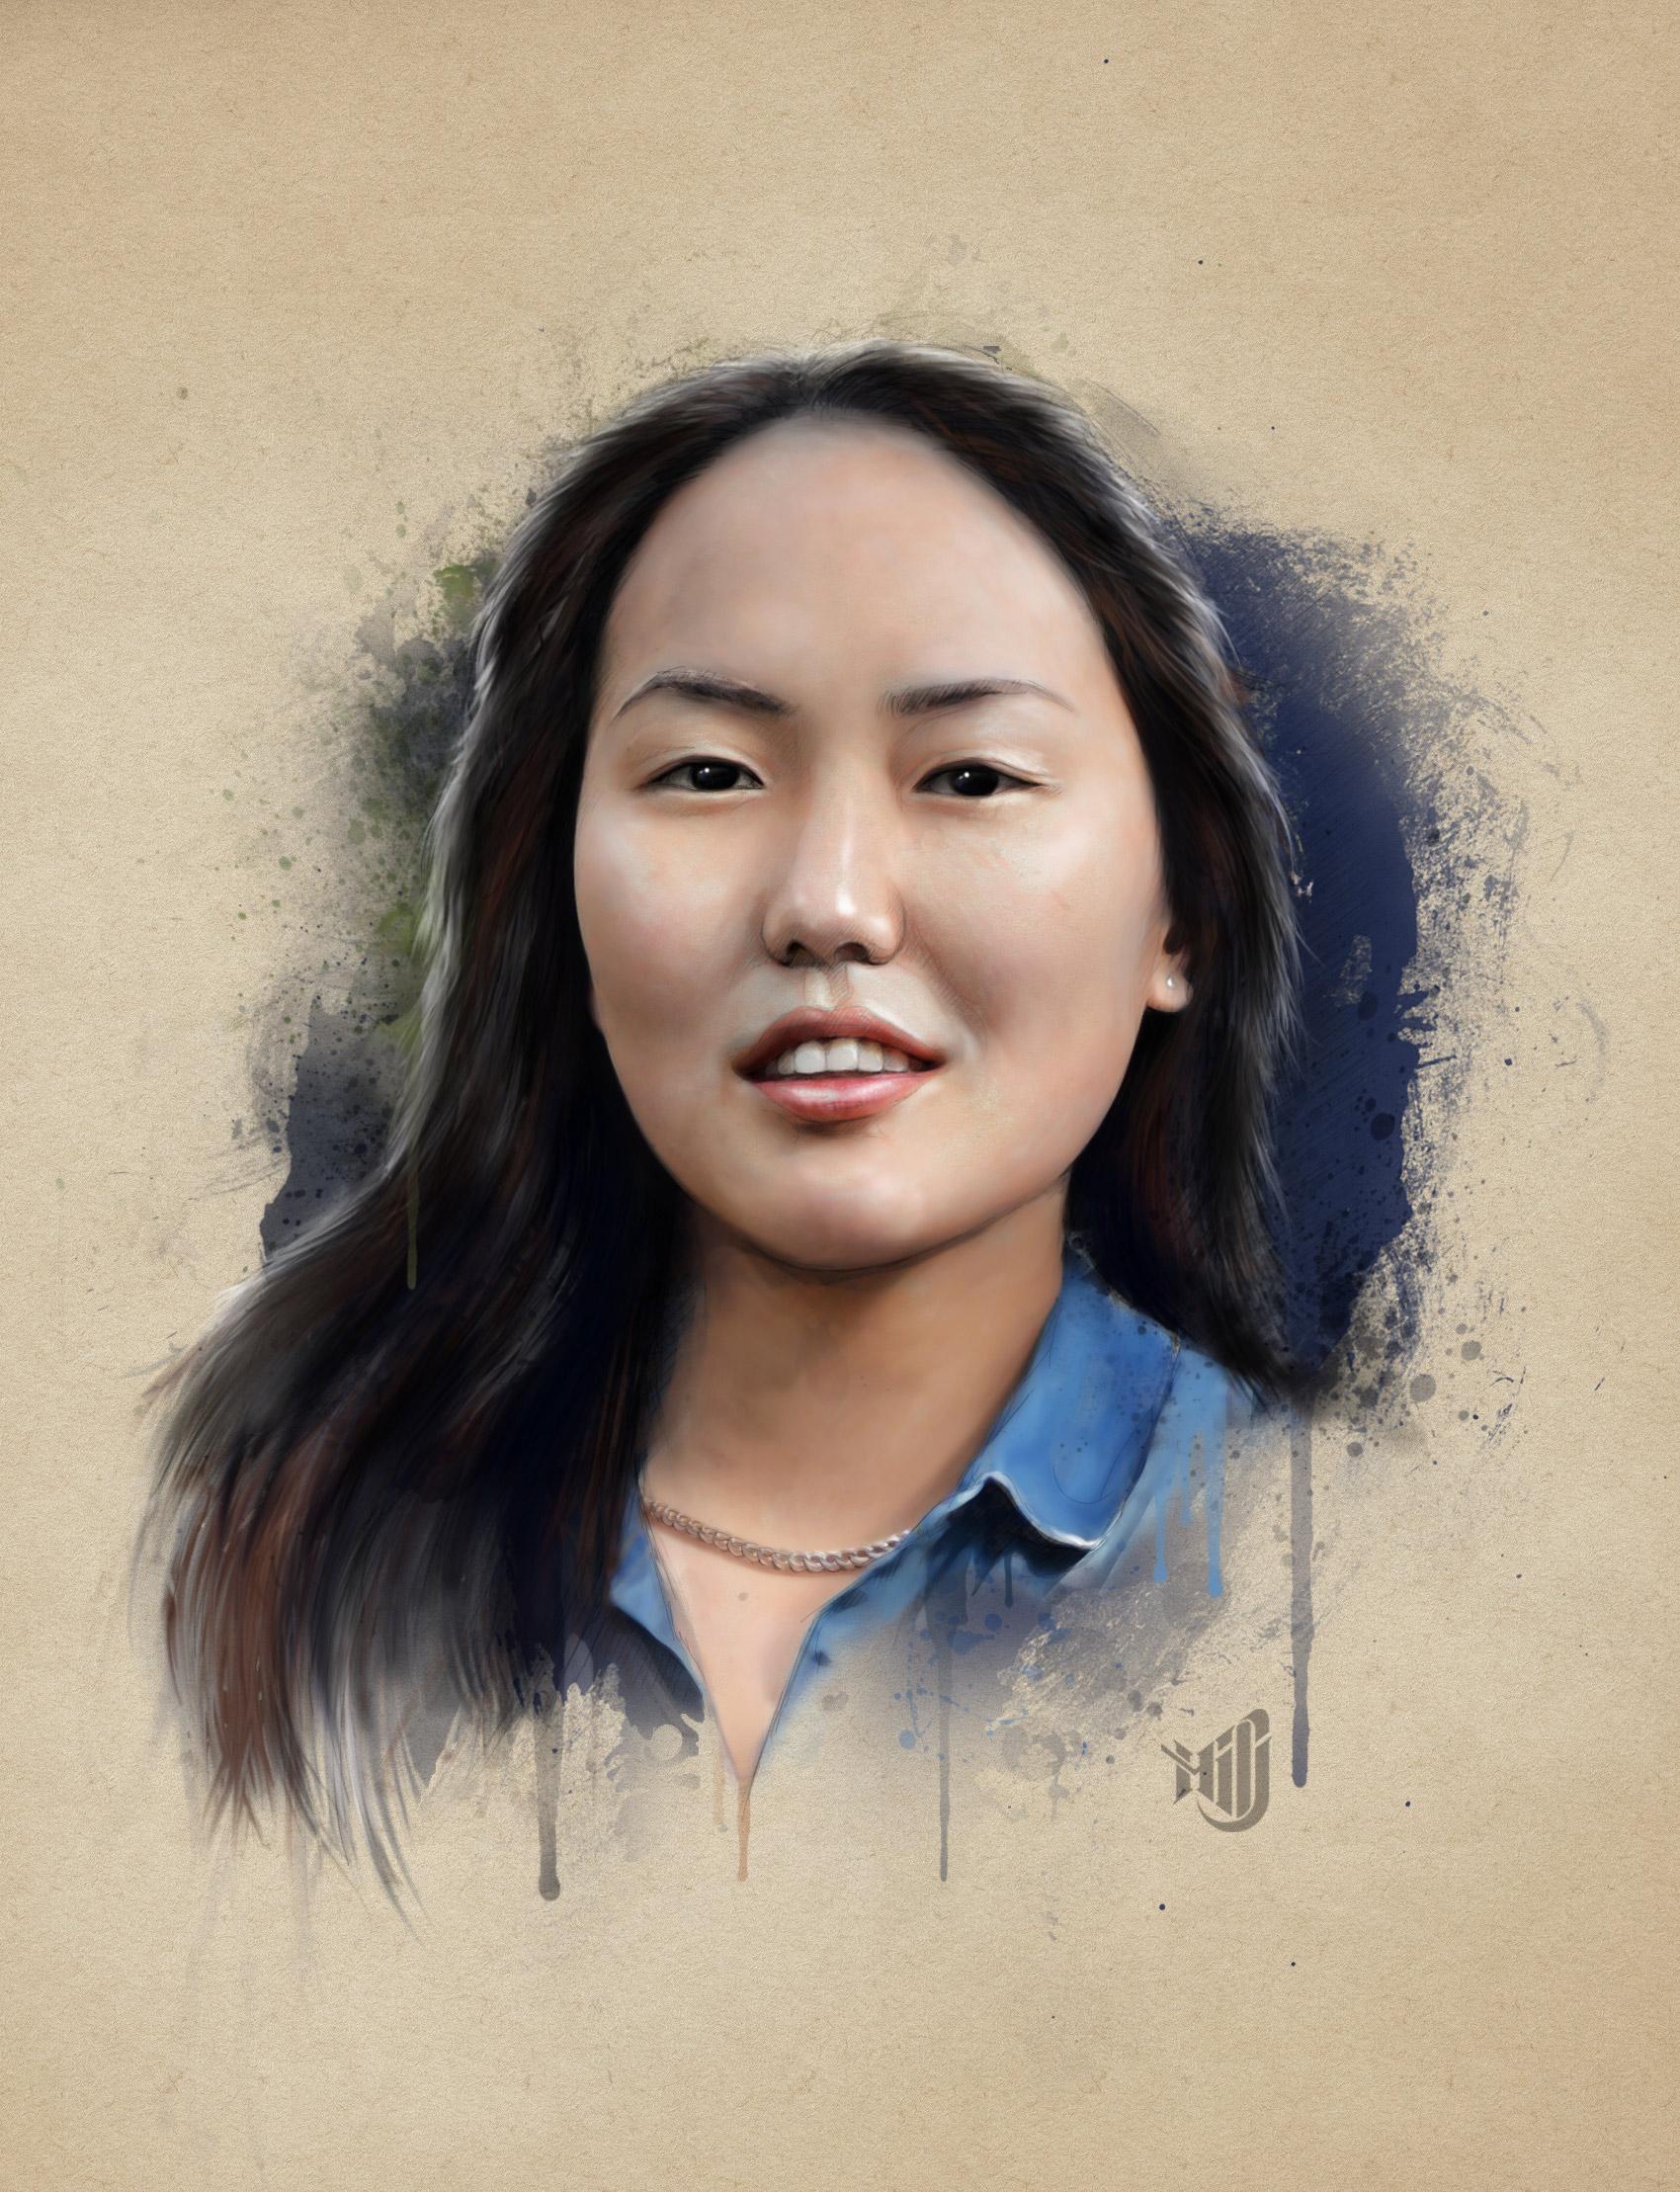 Цифровой портрет по фото